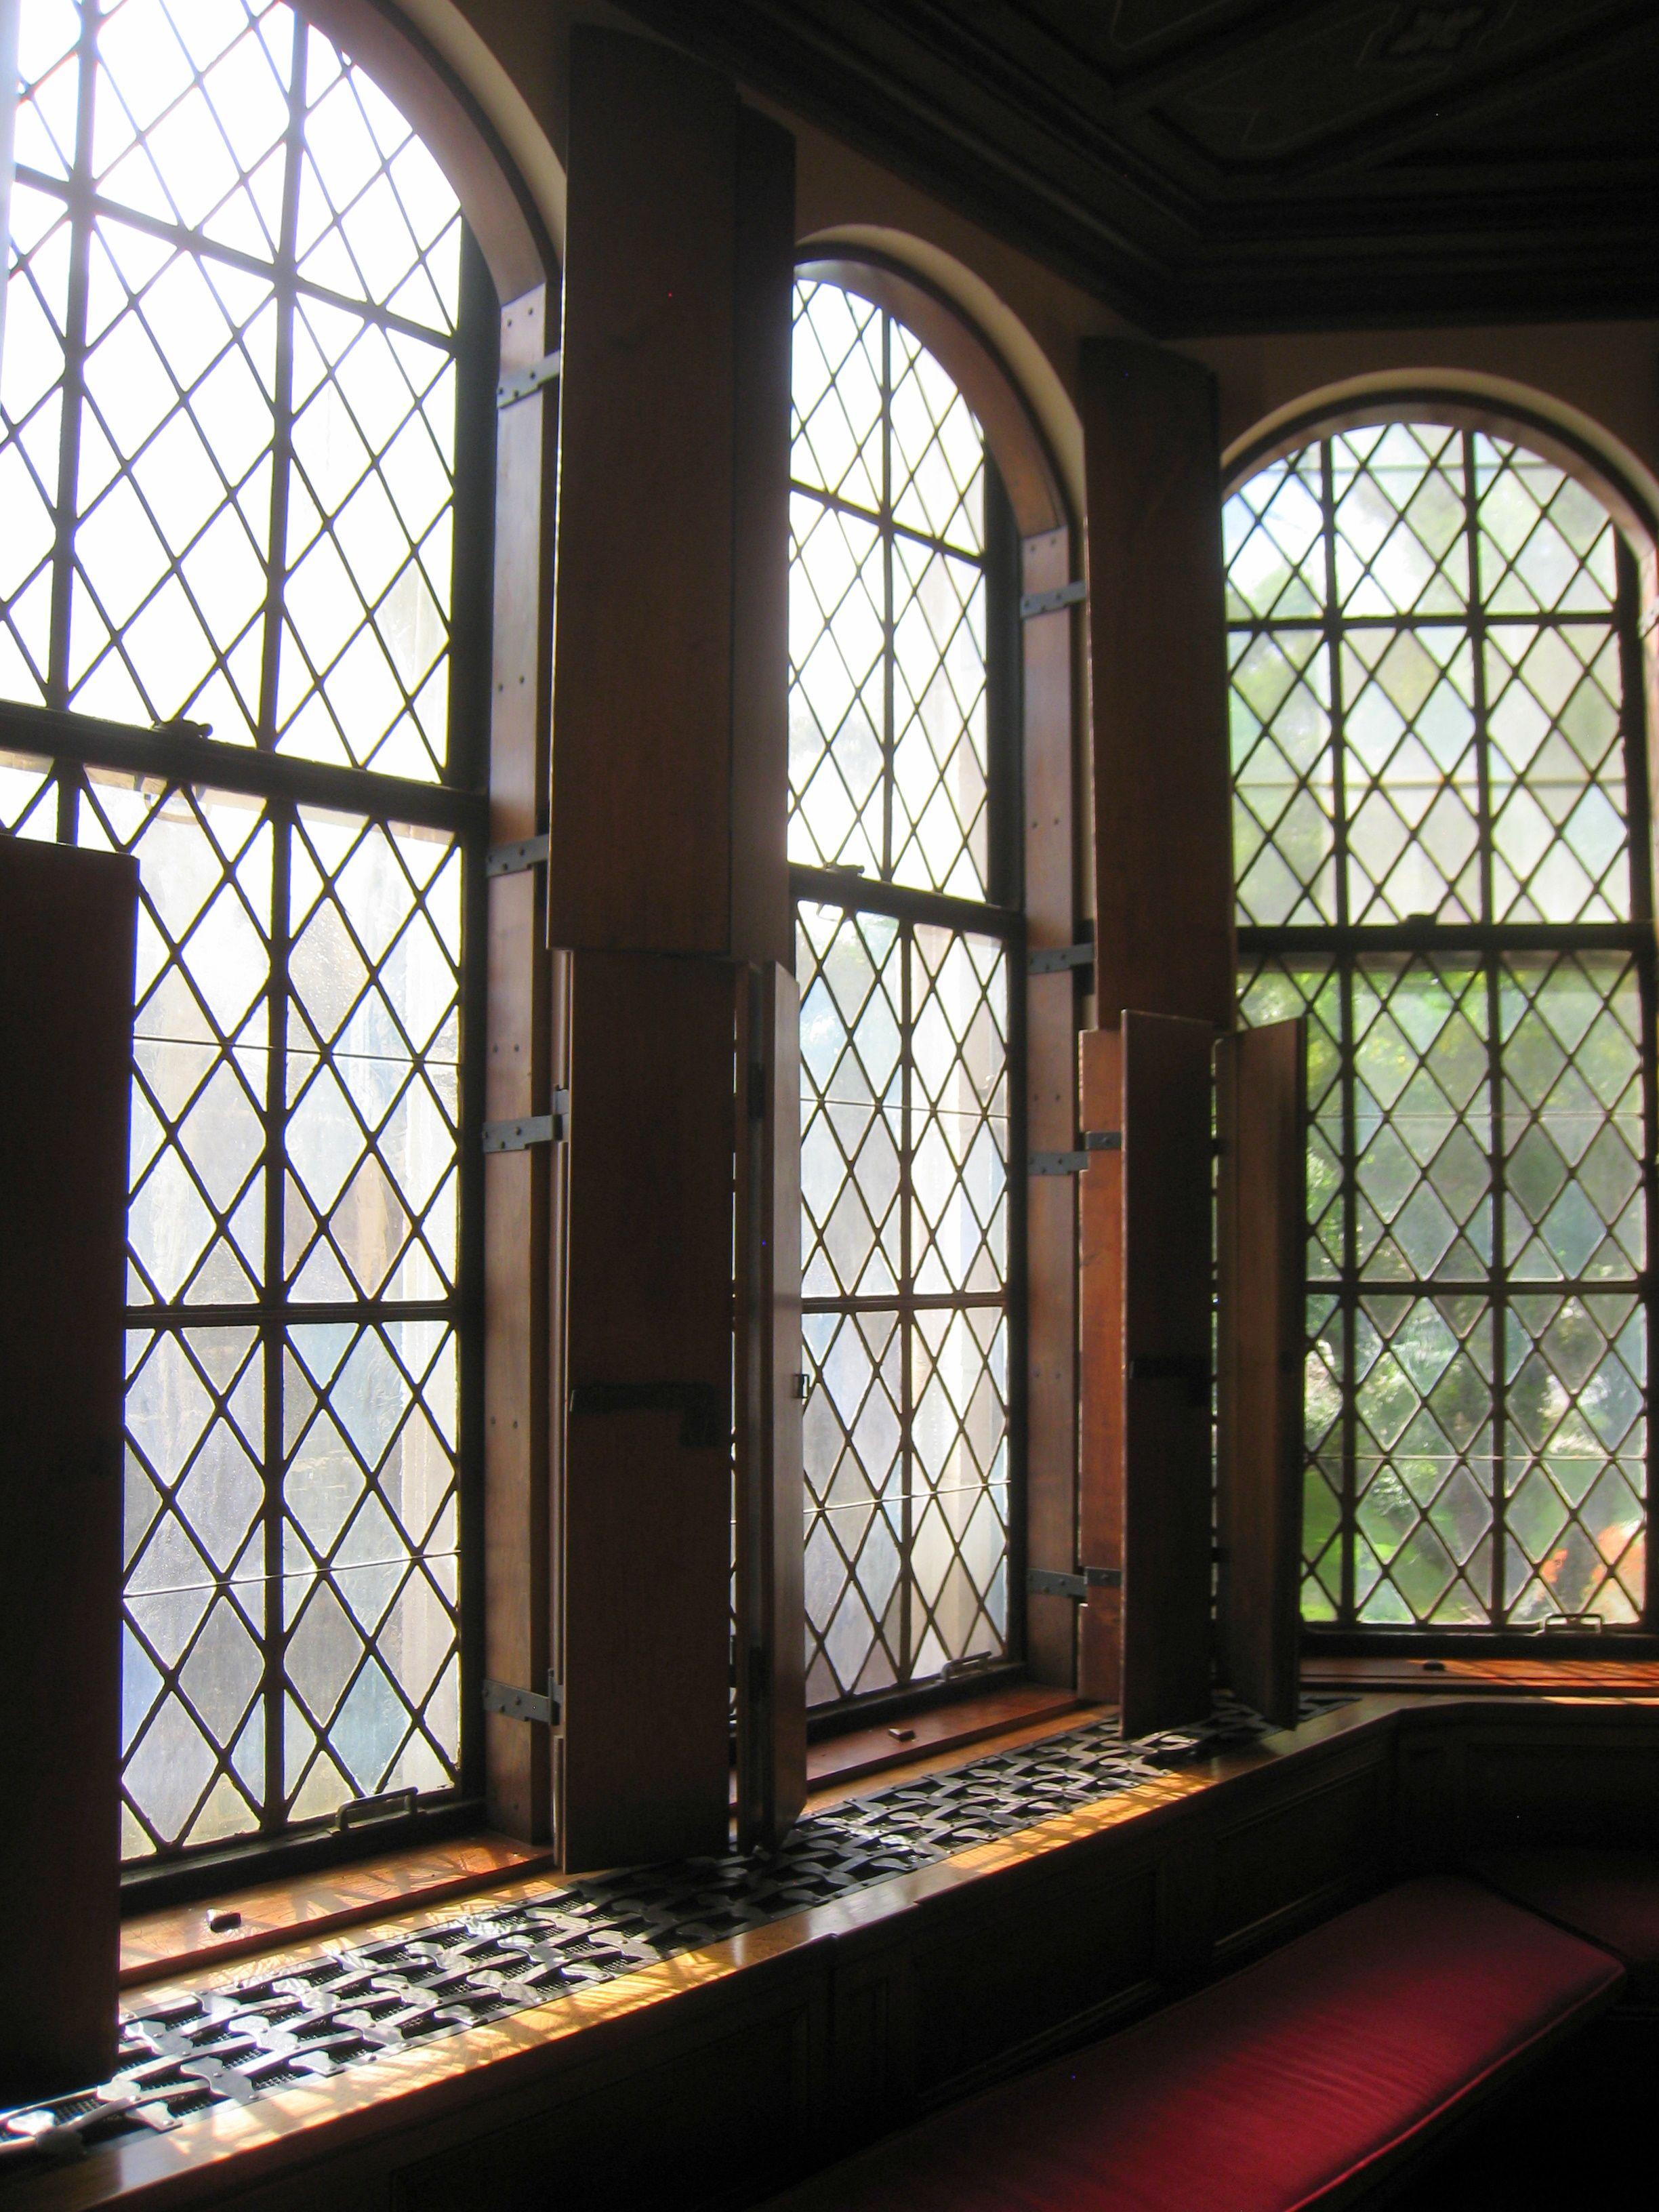 Diamond Pane Windows Only Floor To Ceiling Please